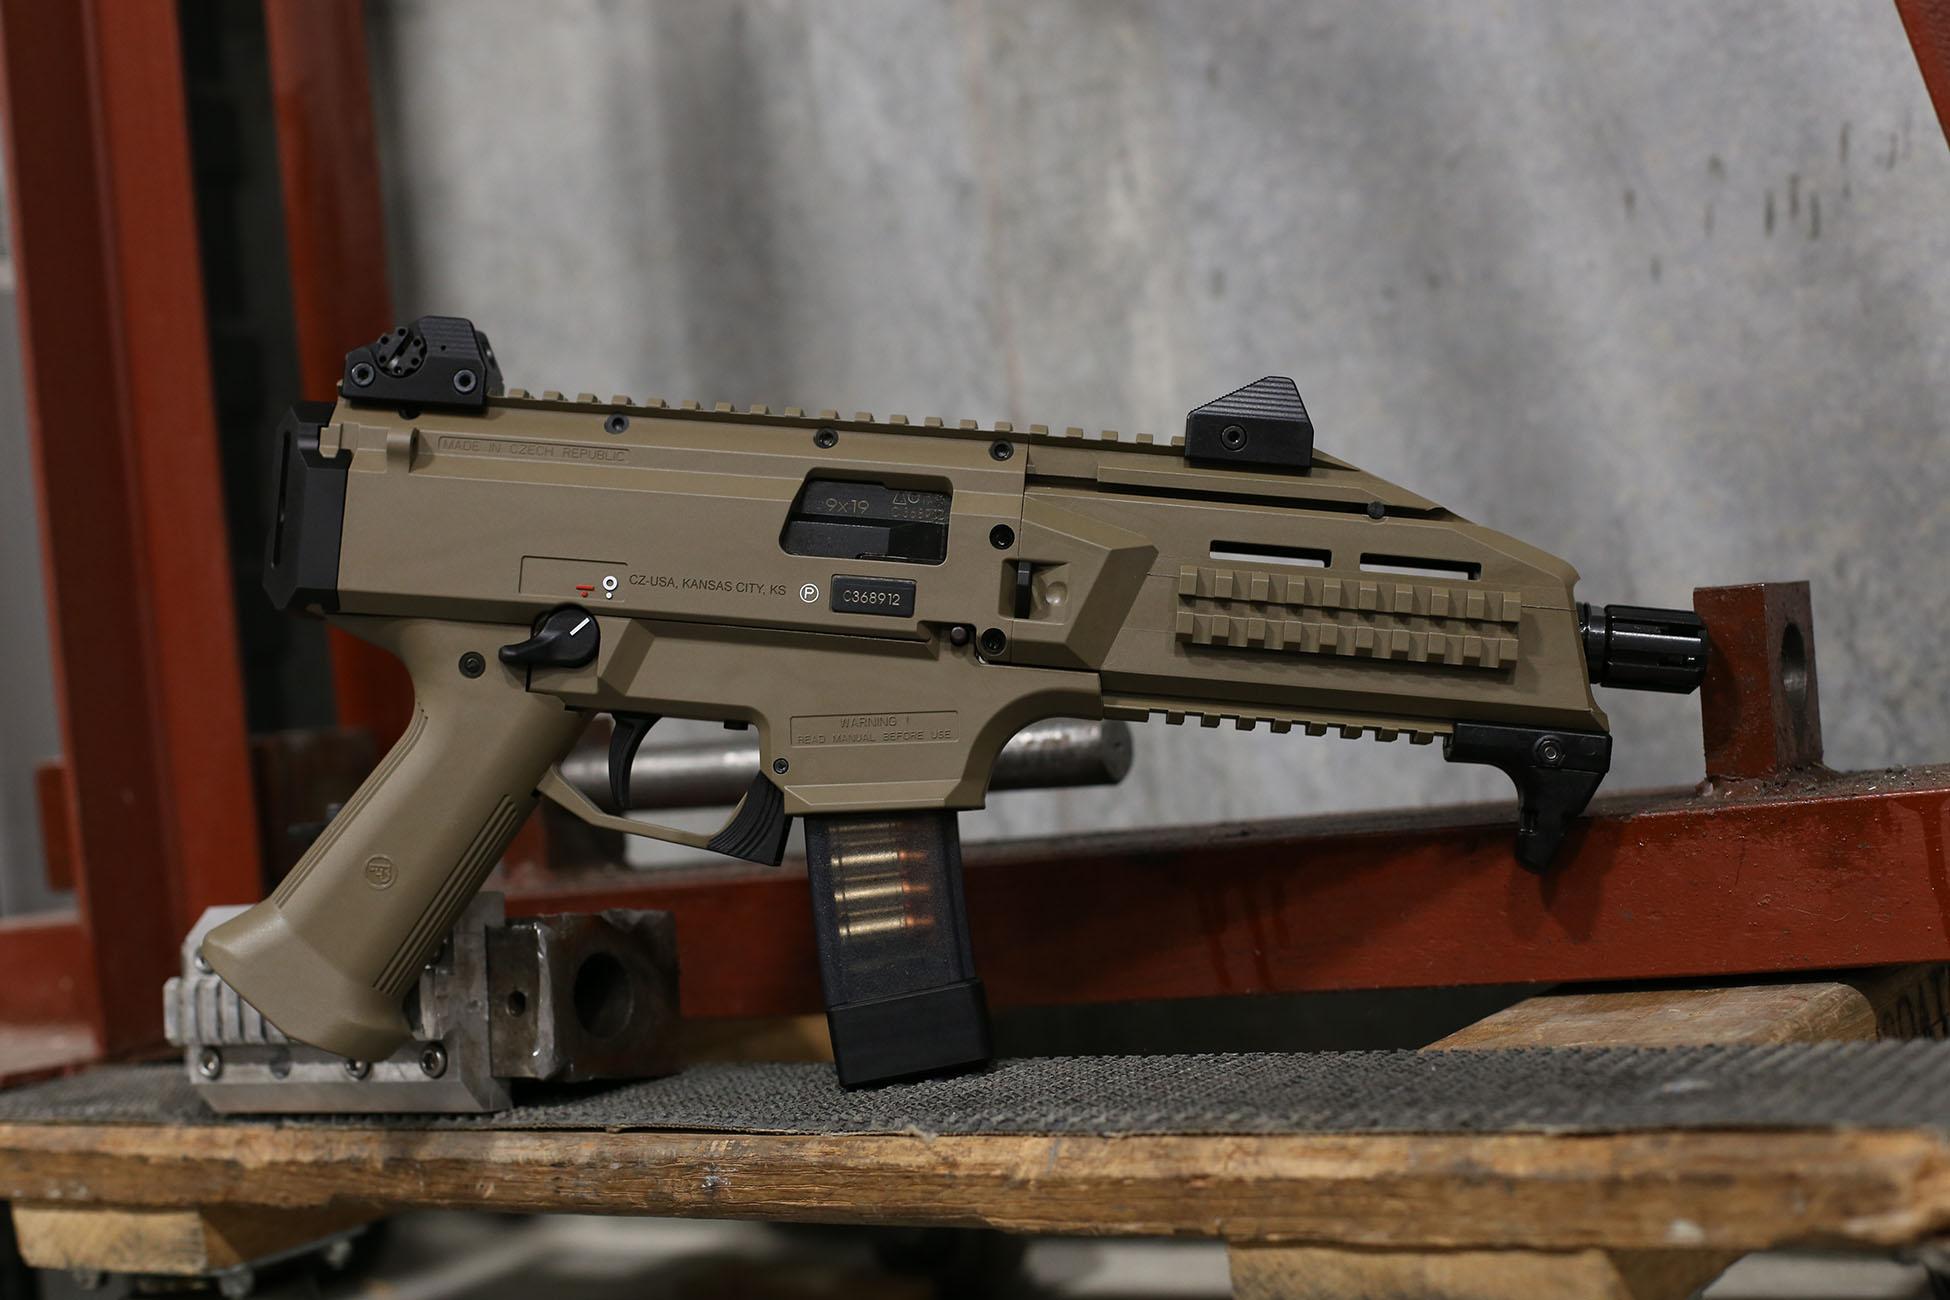 CZ Scorpion Evo S3 pistol caliber carbine Chambered in 9mm ammunition